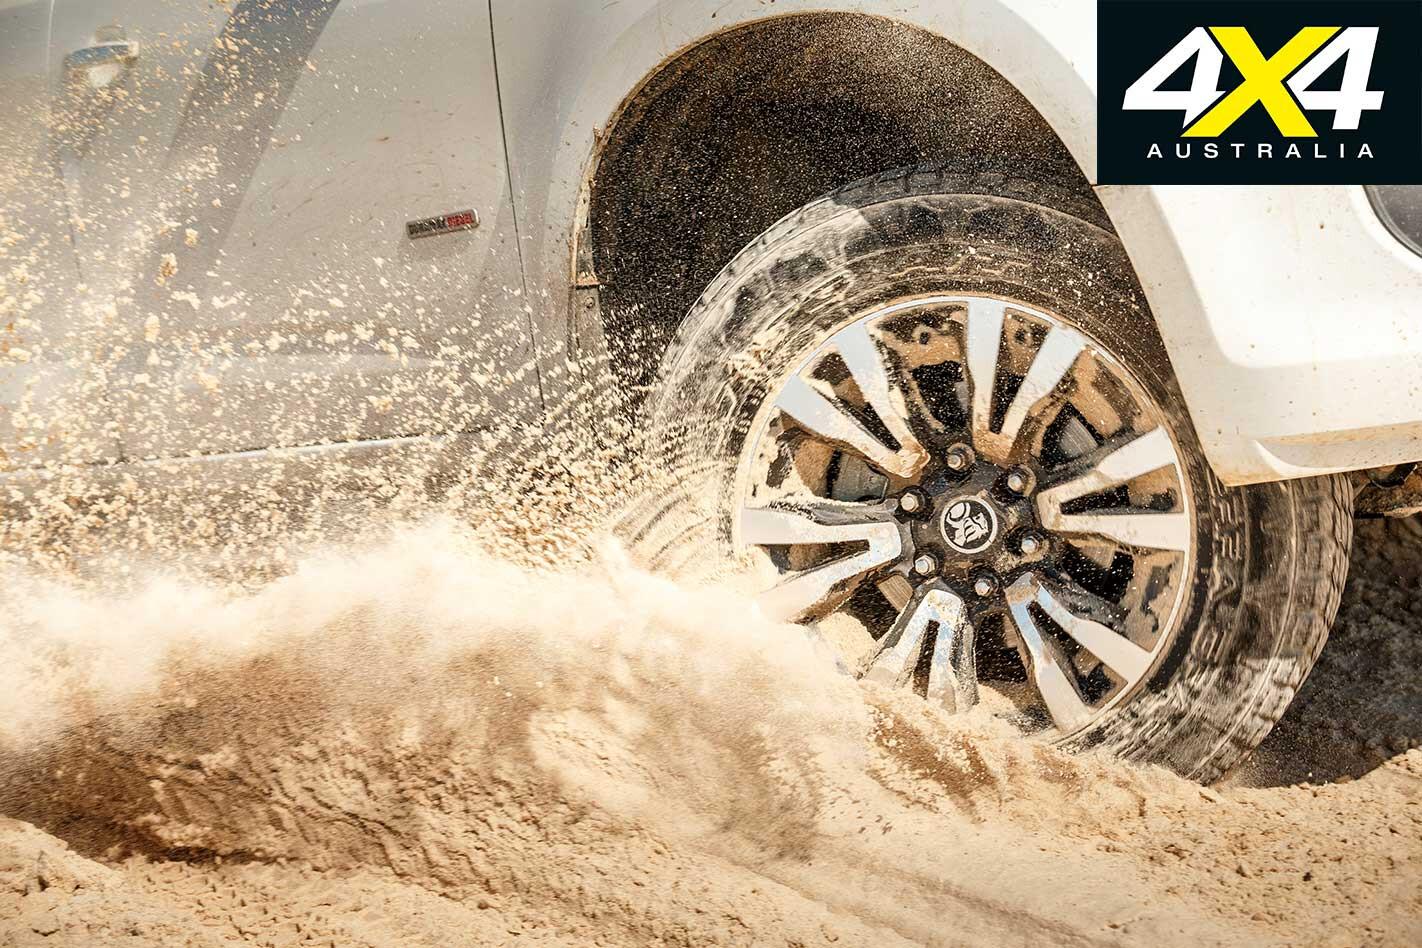 4 X 4 Adventure Series South East Queensland Part 2 Sand Tyres Jpg